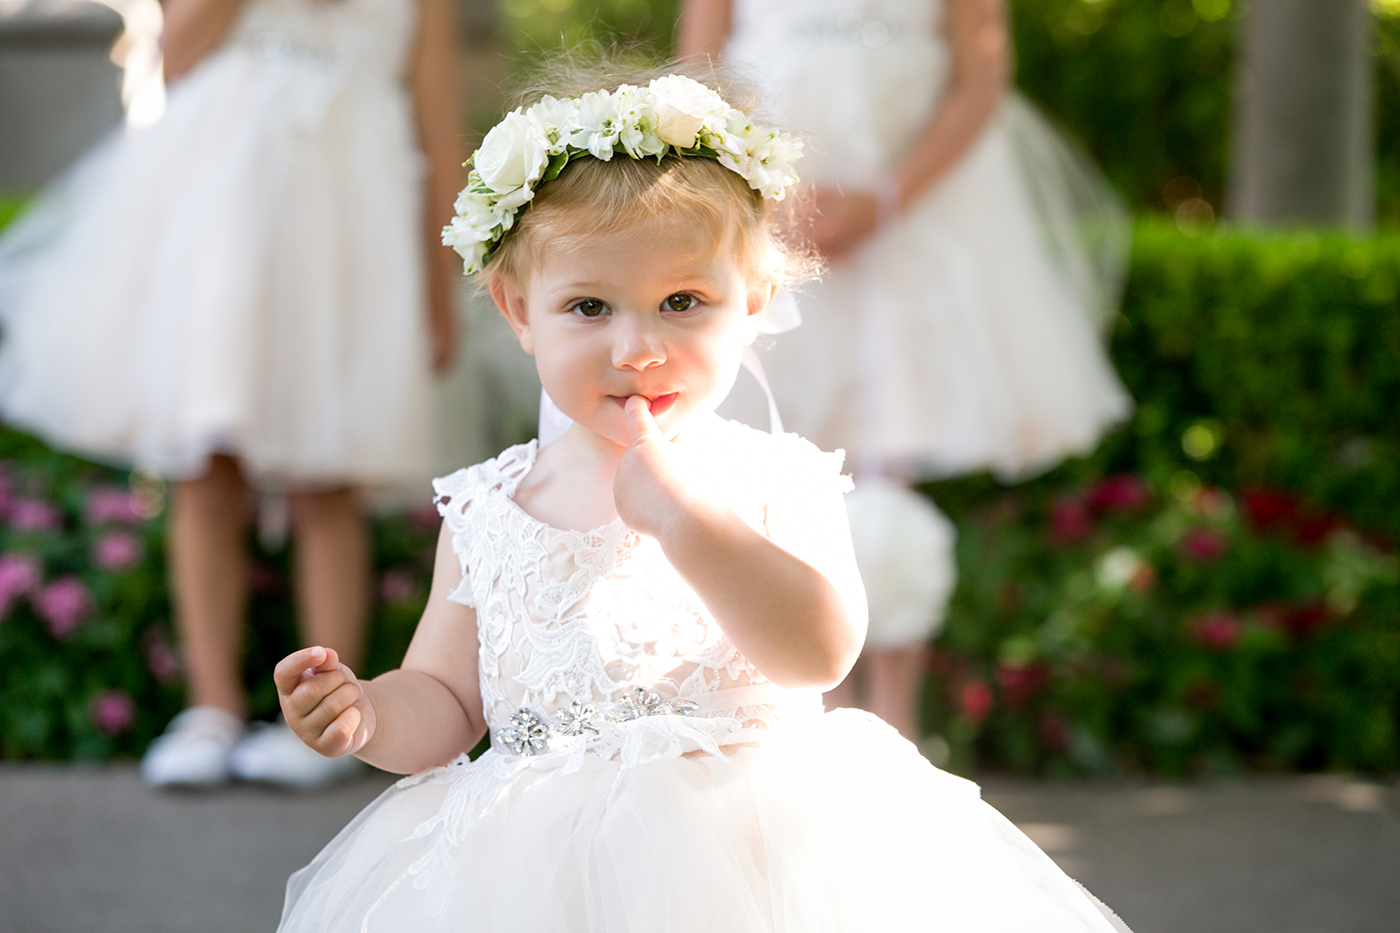 Wedding Planner Dallas TX - Allday Events - Highland Park - Marie Gabrielle Wedding - 205.jpg